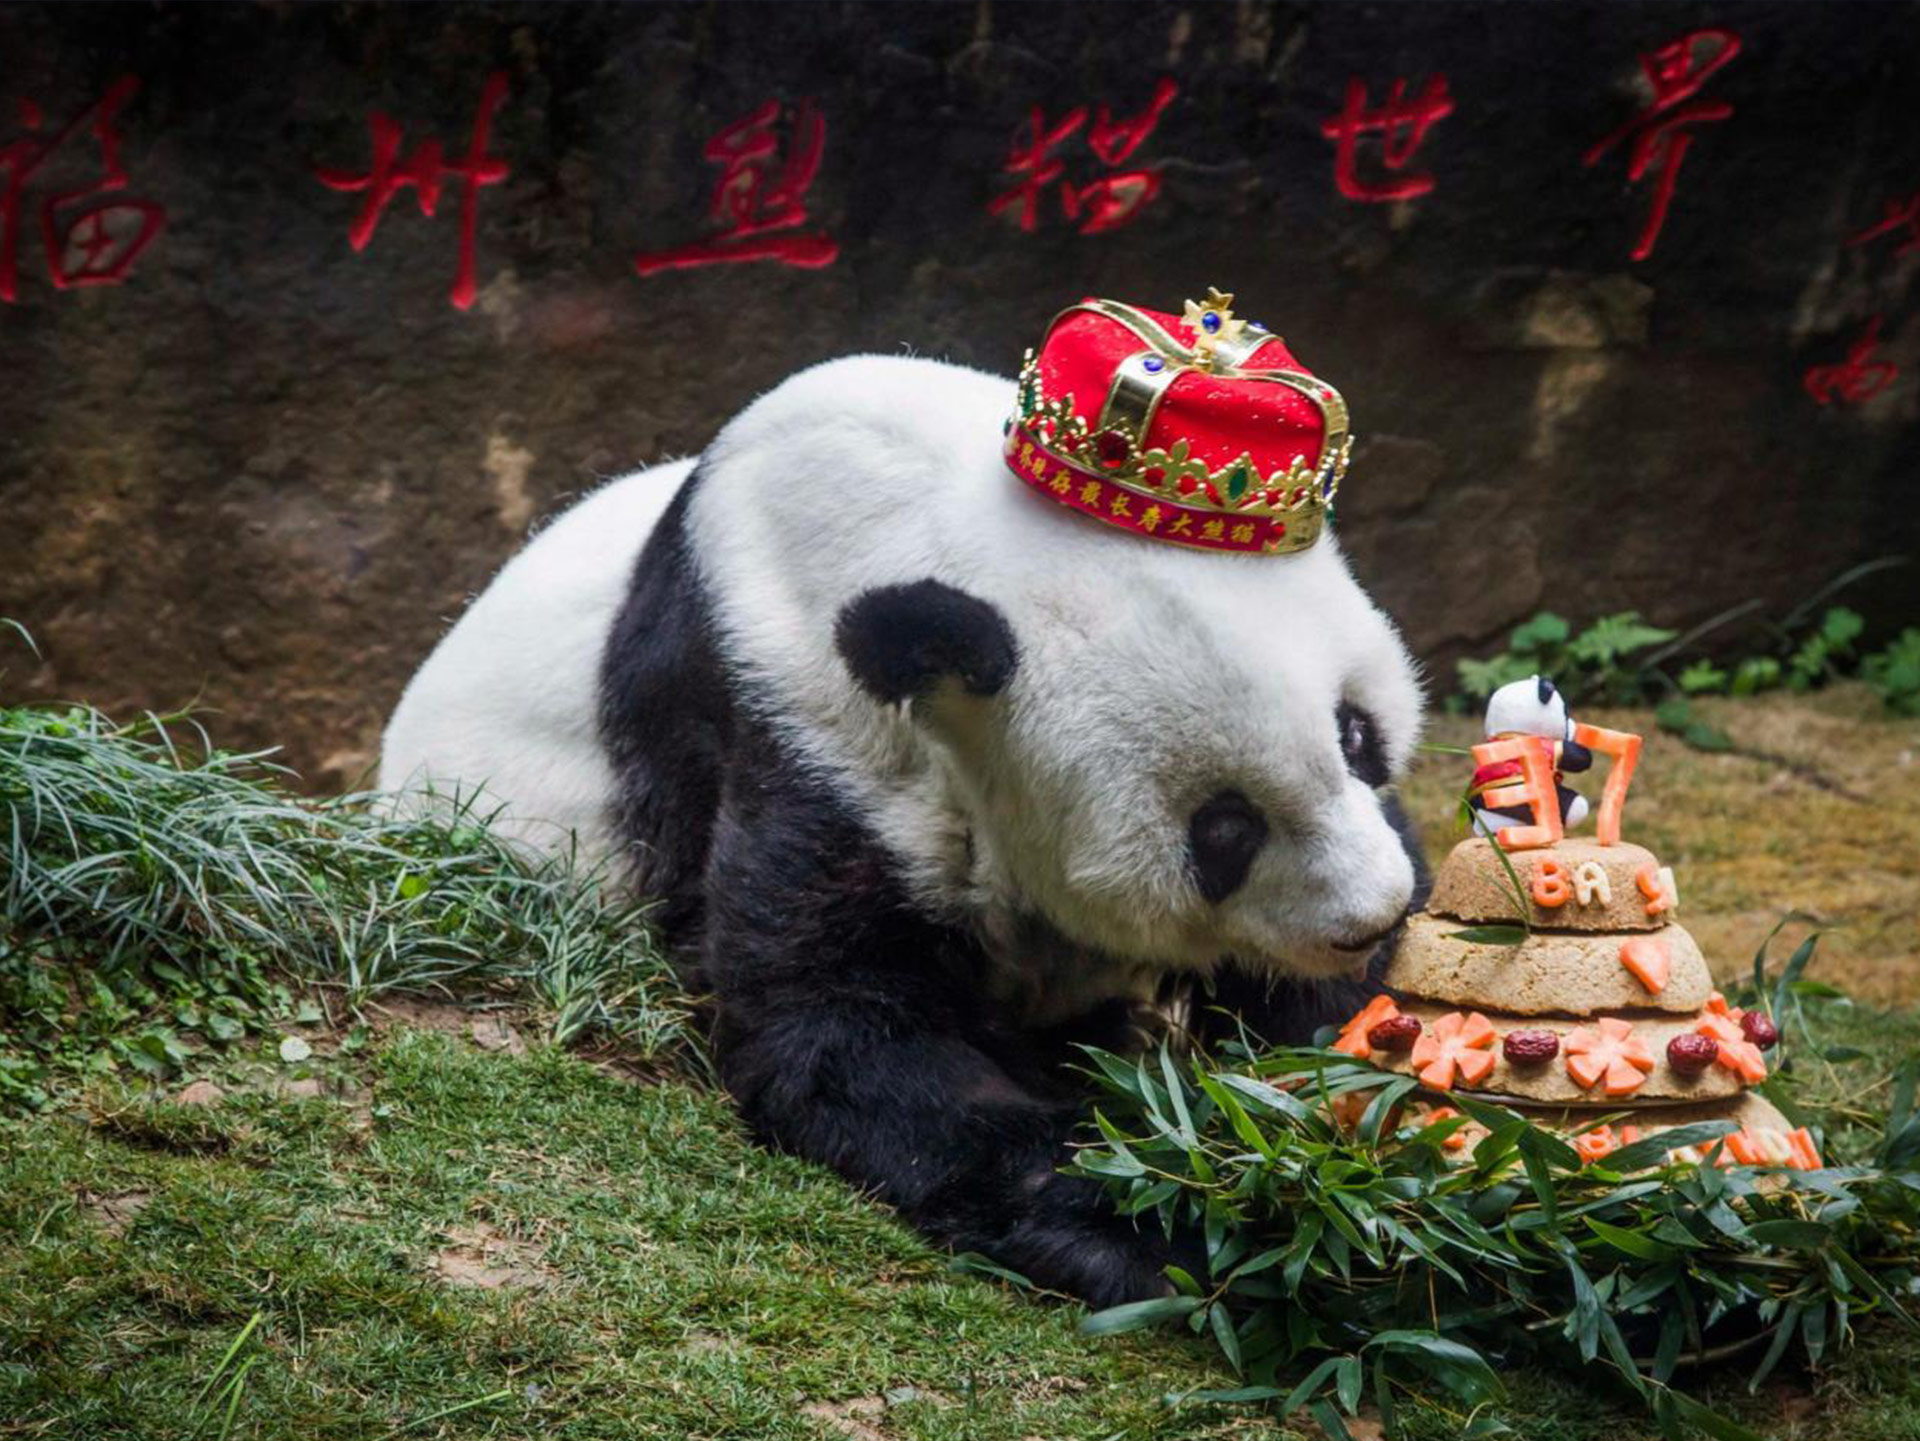 World's oldest giant panda in captivity dies